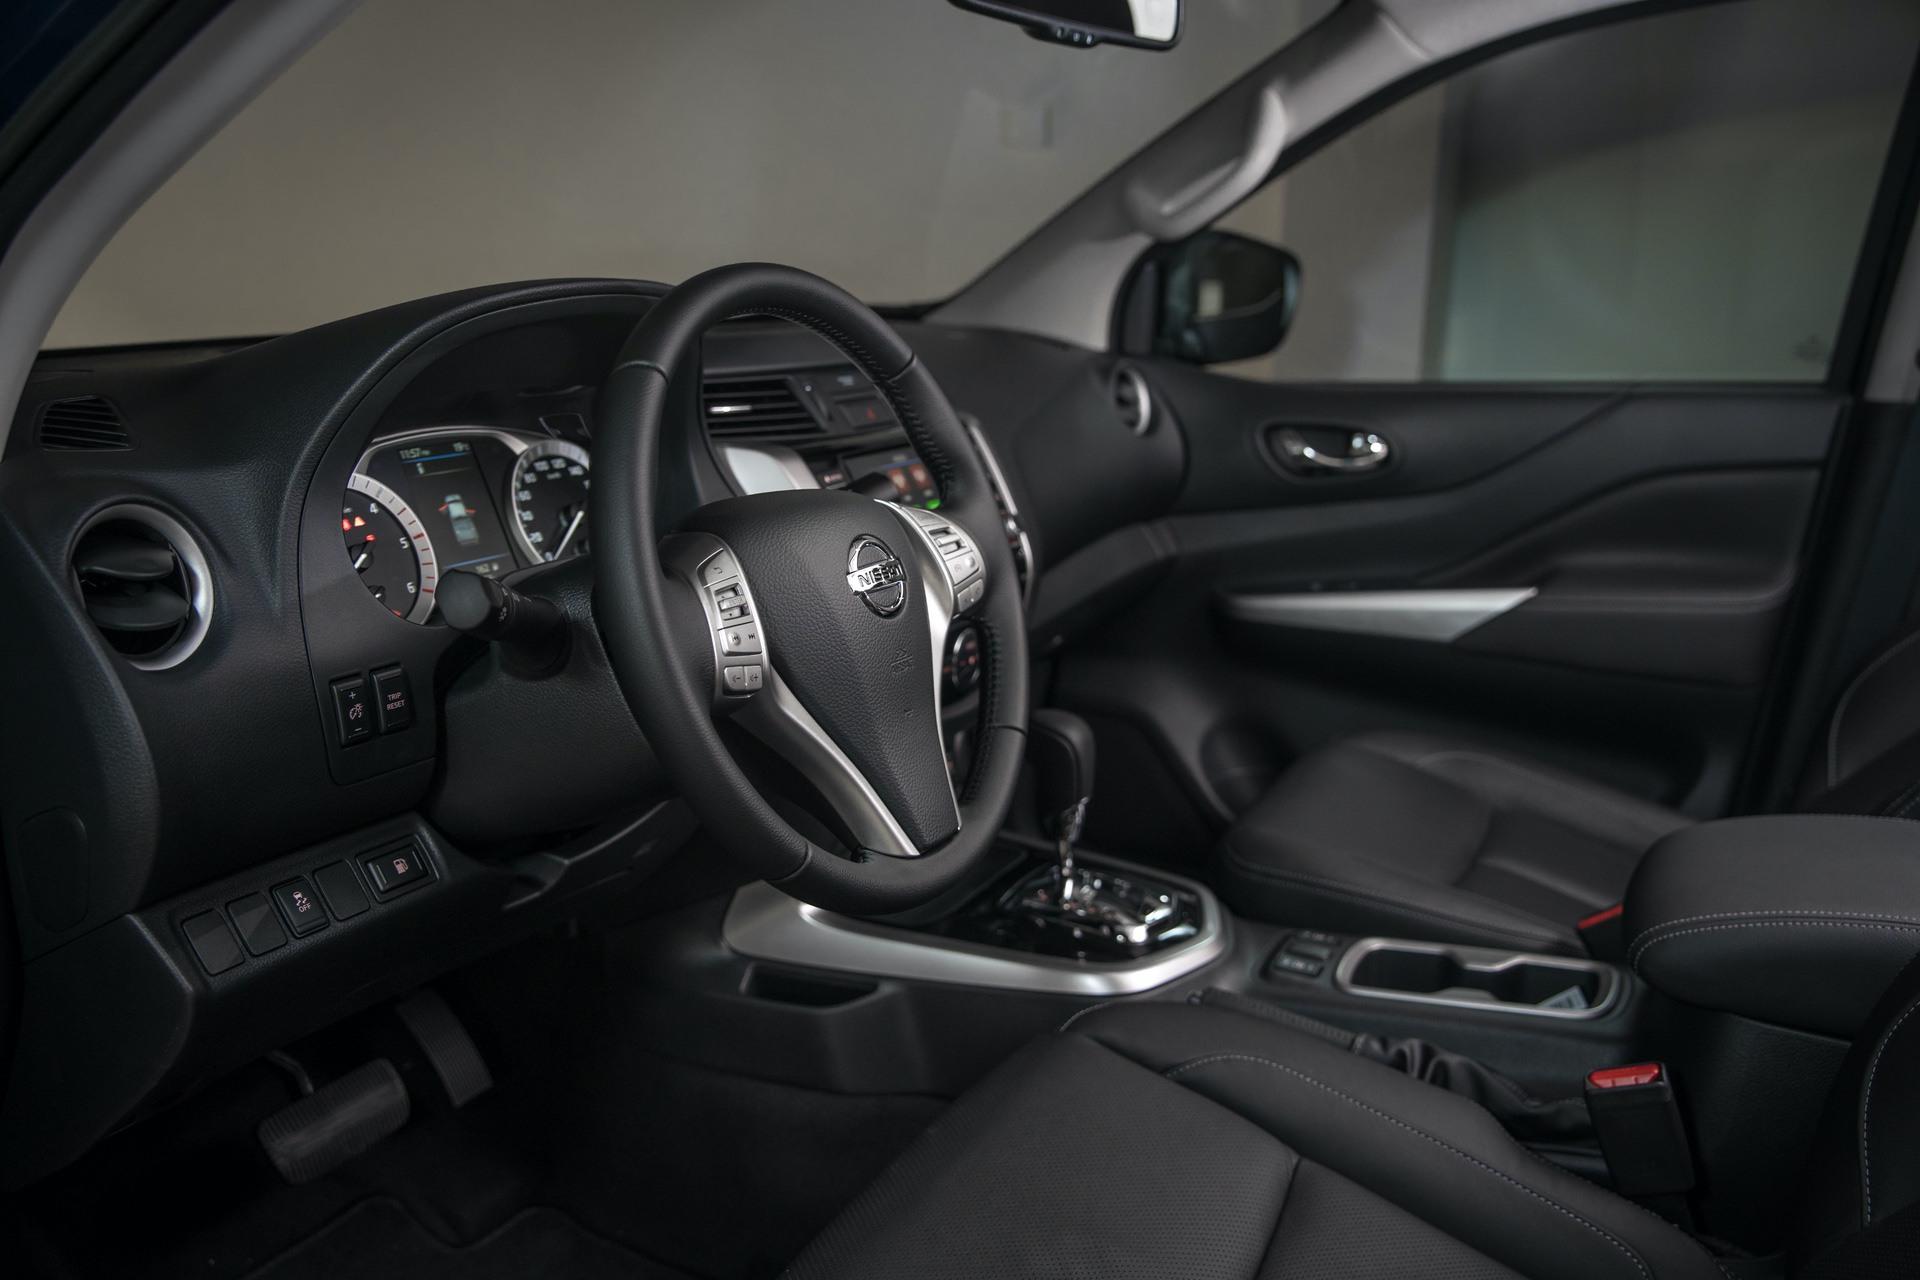 Nissan-Navara-Double-Cab-Interior-3